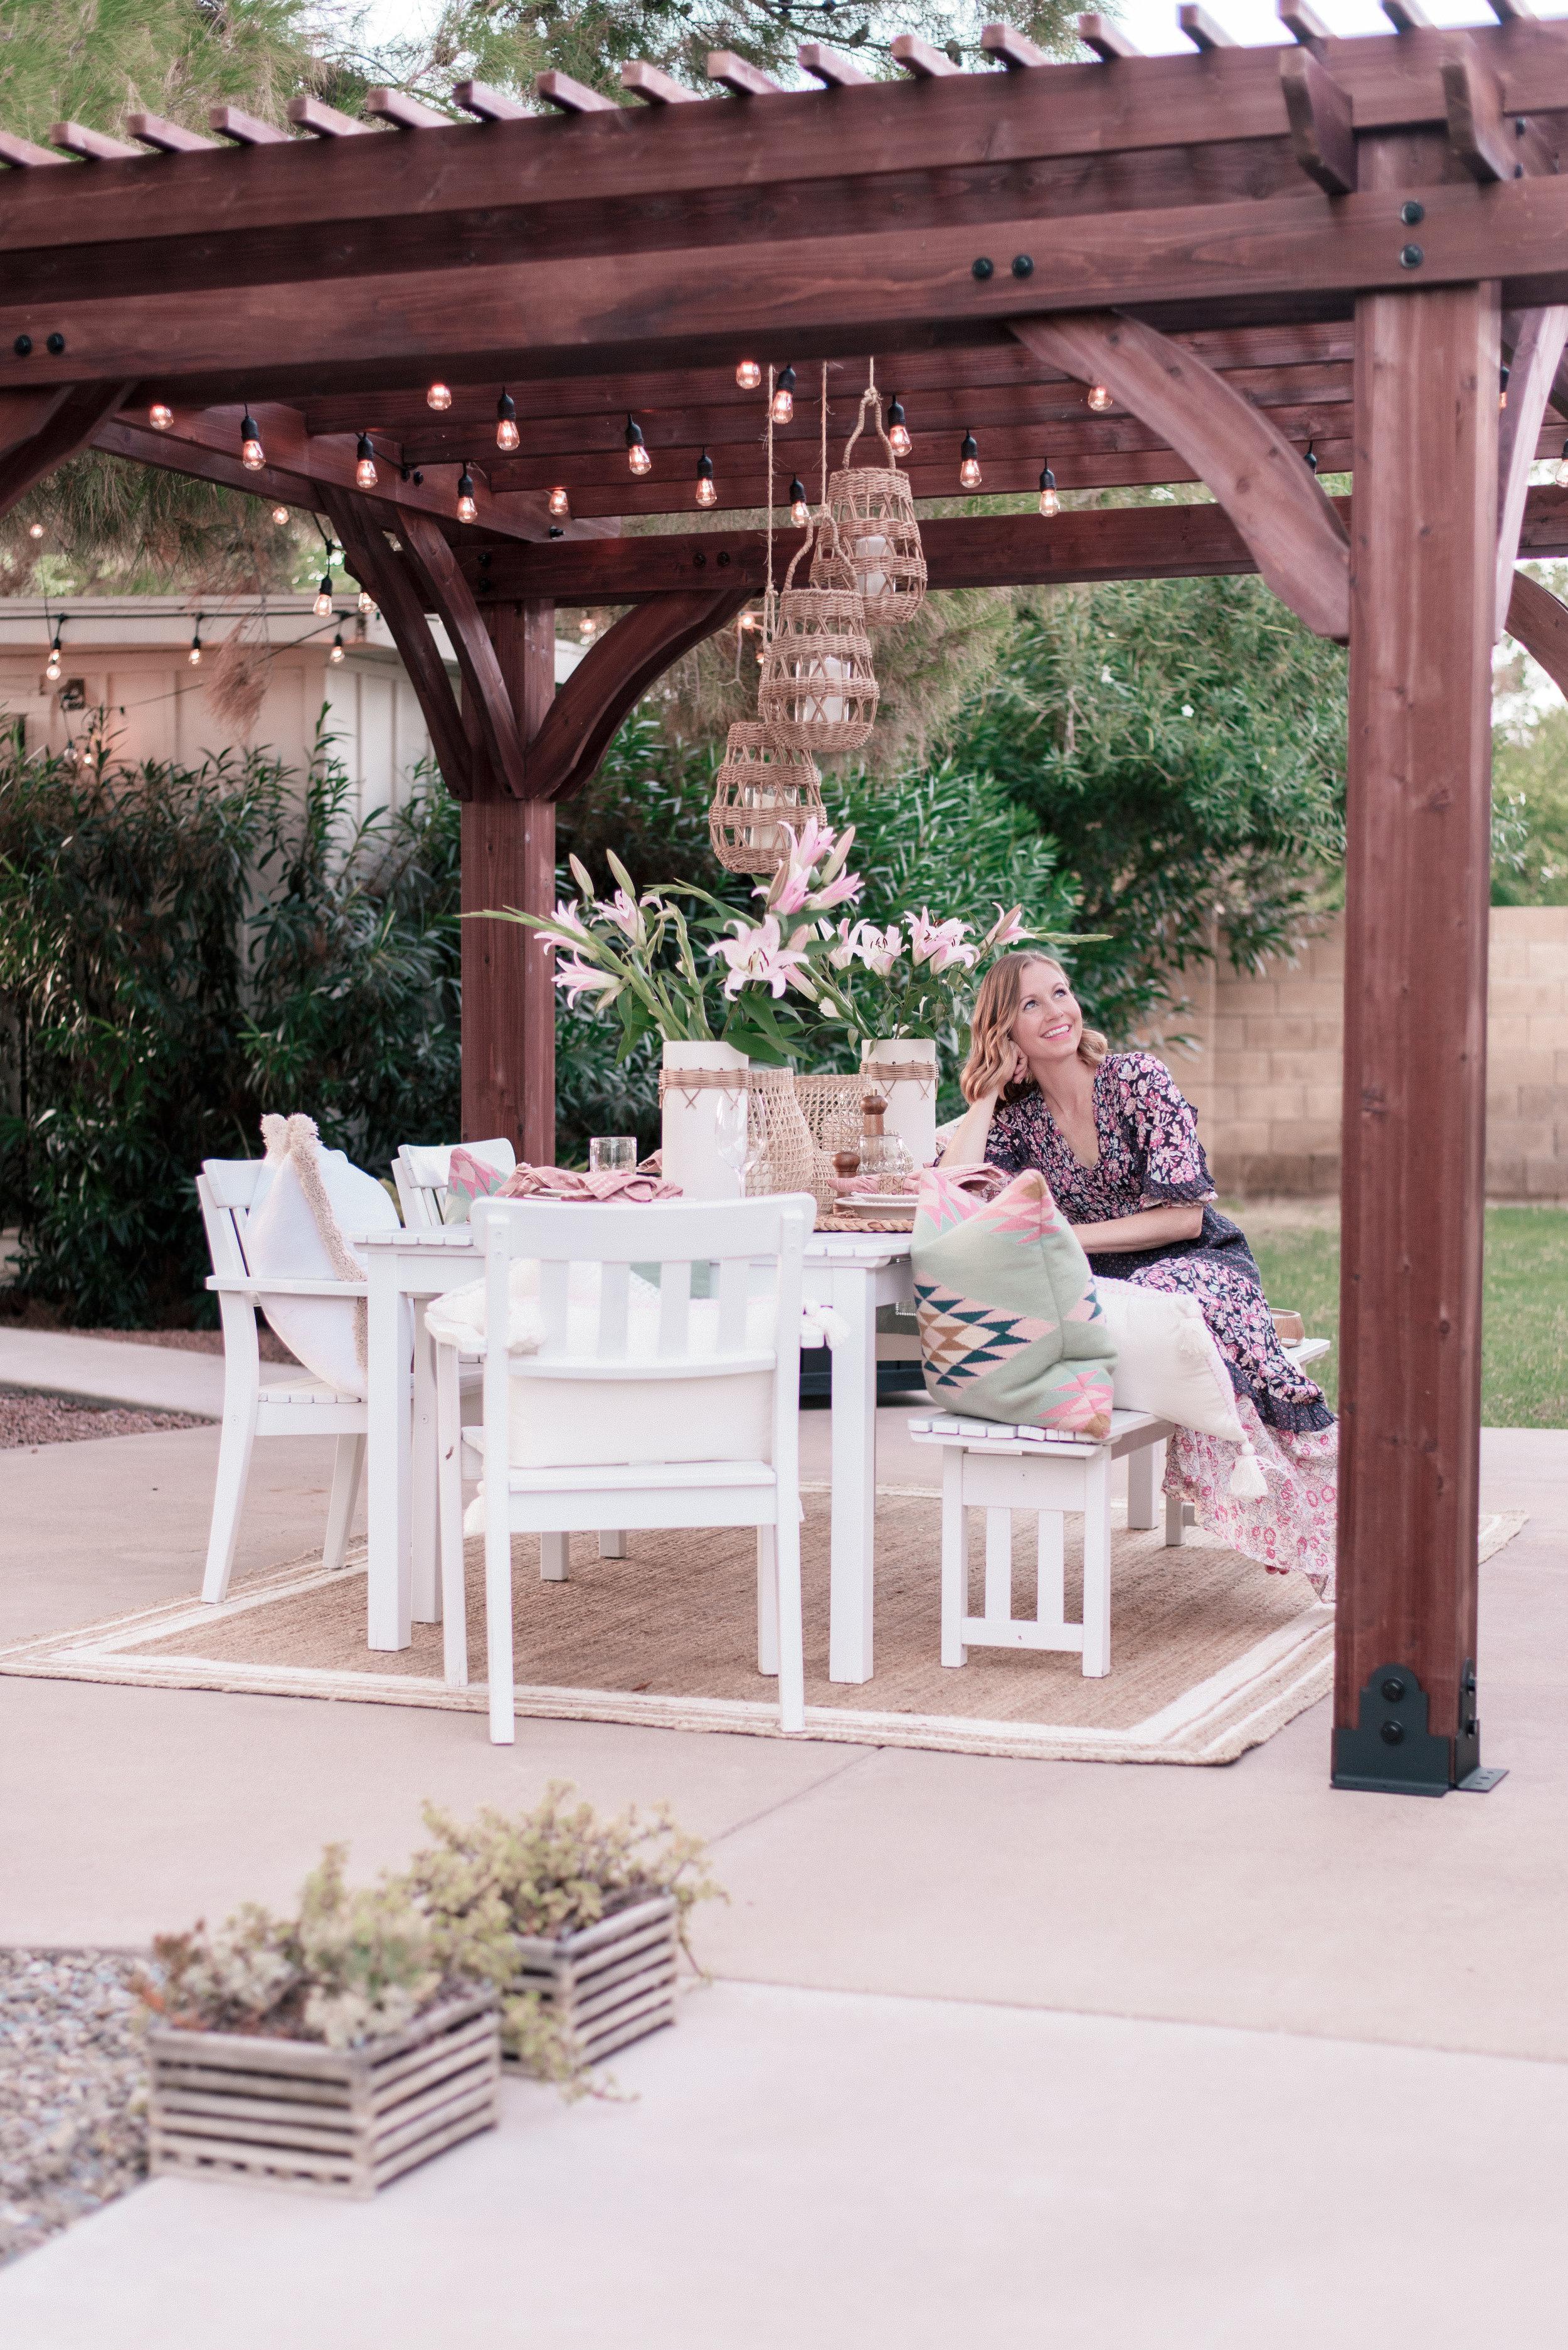 backyard-patio-pergola-plans-4.jpg